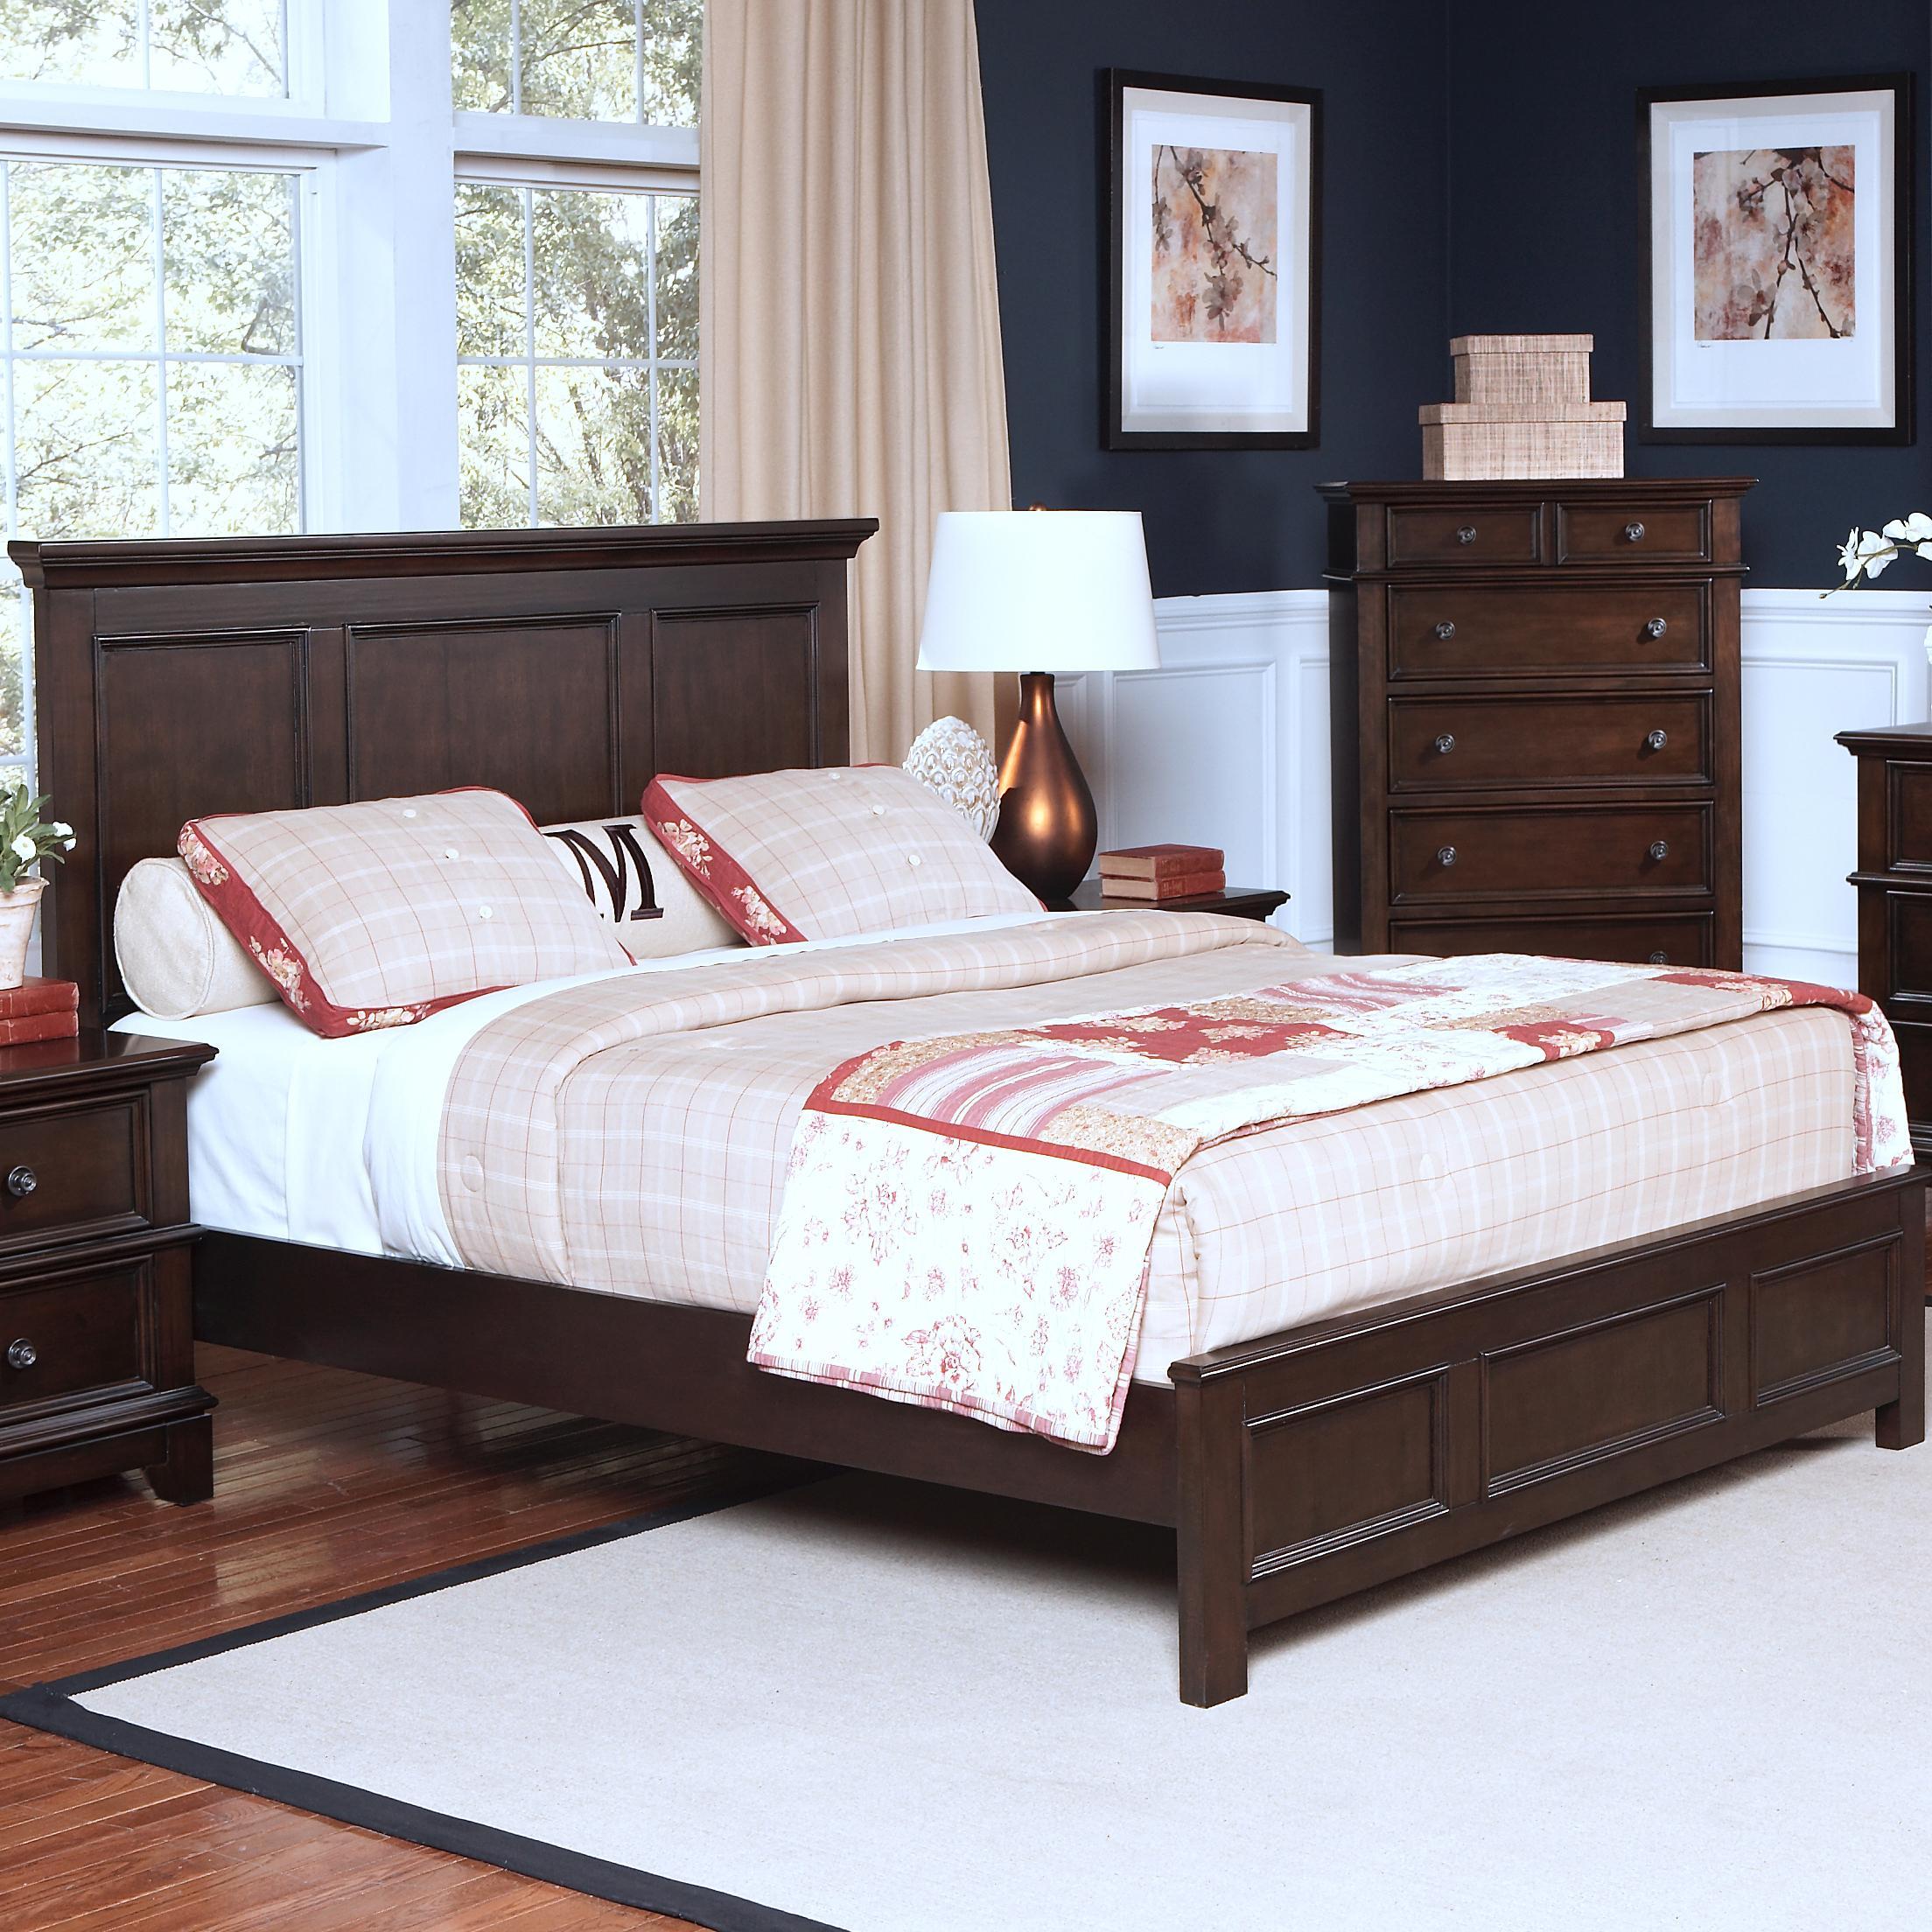 new classic prescott king headboard and footboard bed del sol furniture panel beds. Black Bedroom Furniture Sets. Home Design Ideas